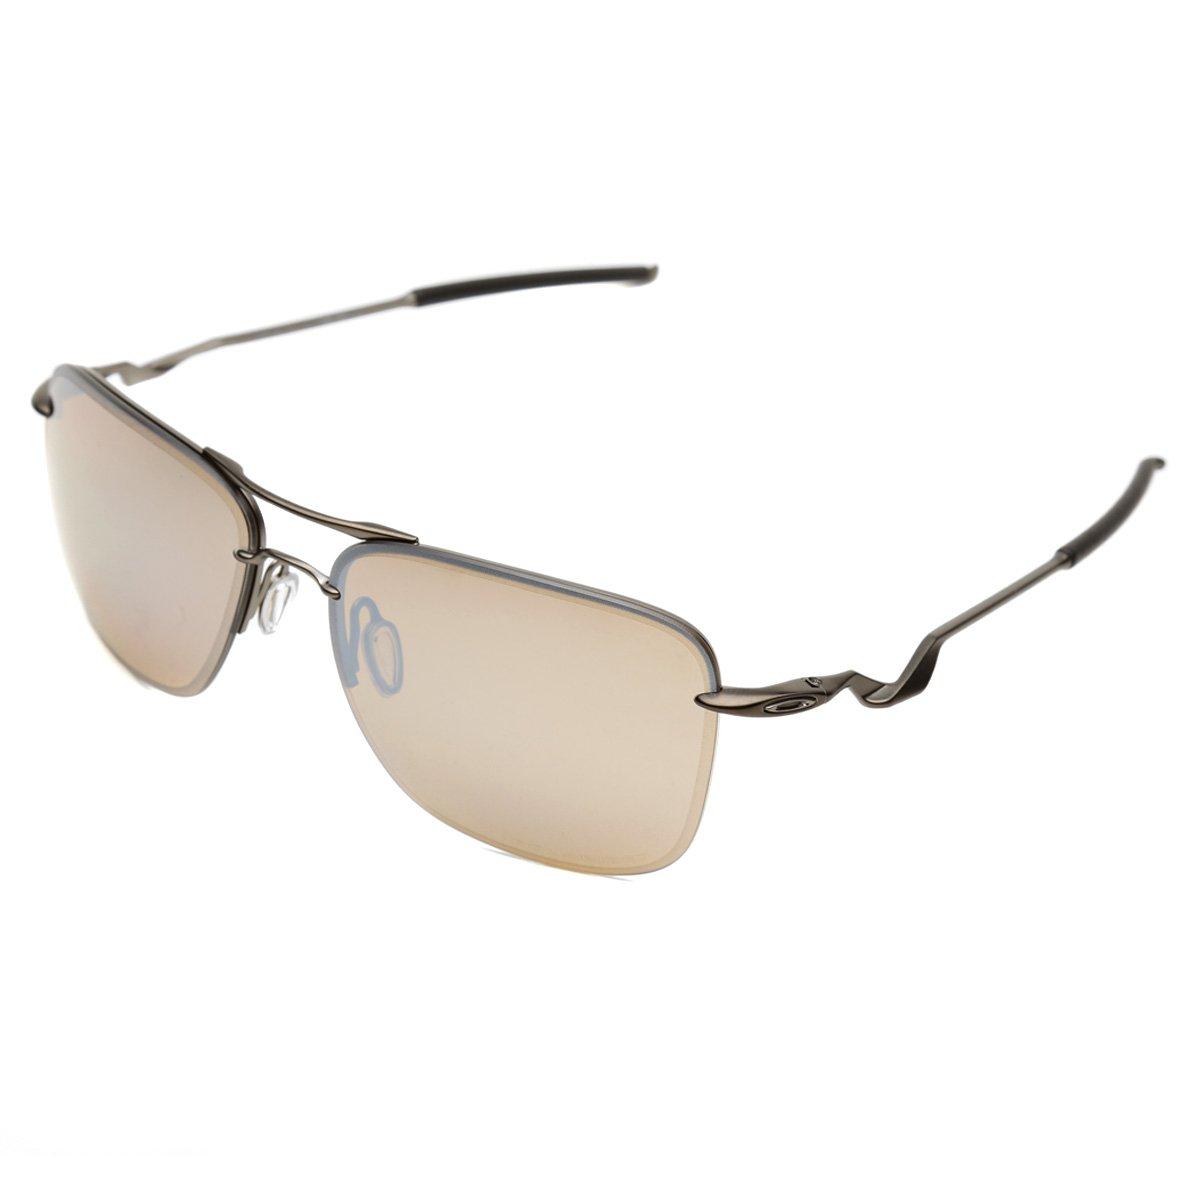 cfd2e57986f60 Óculos de Sol Oakley Tailhook - Compre Agora